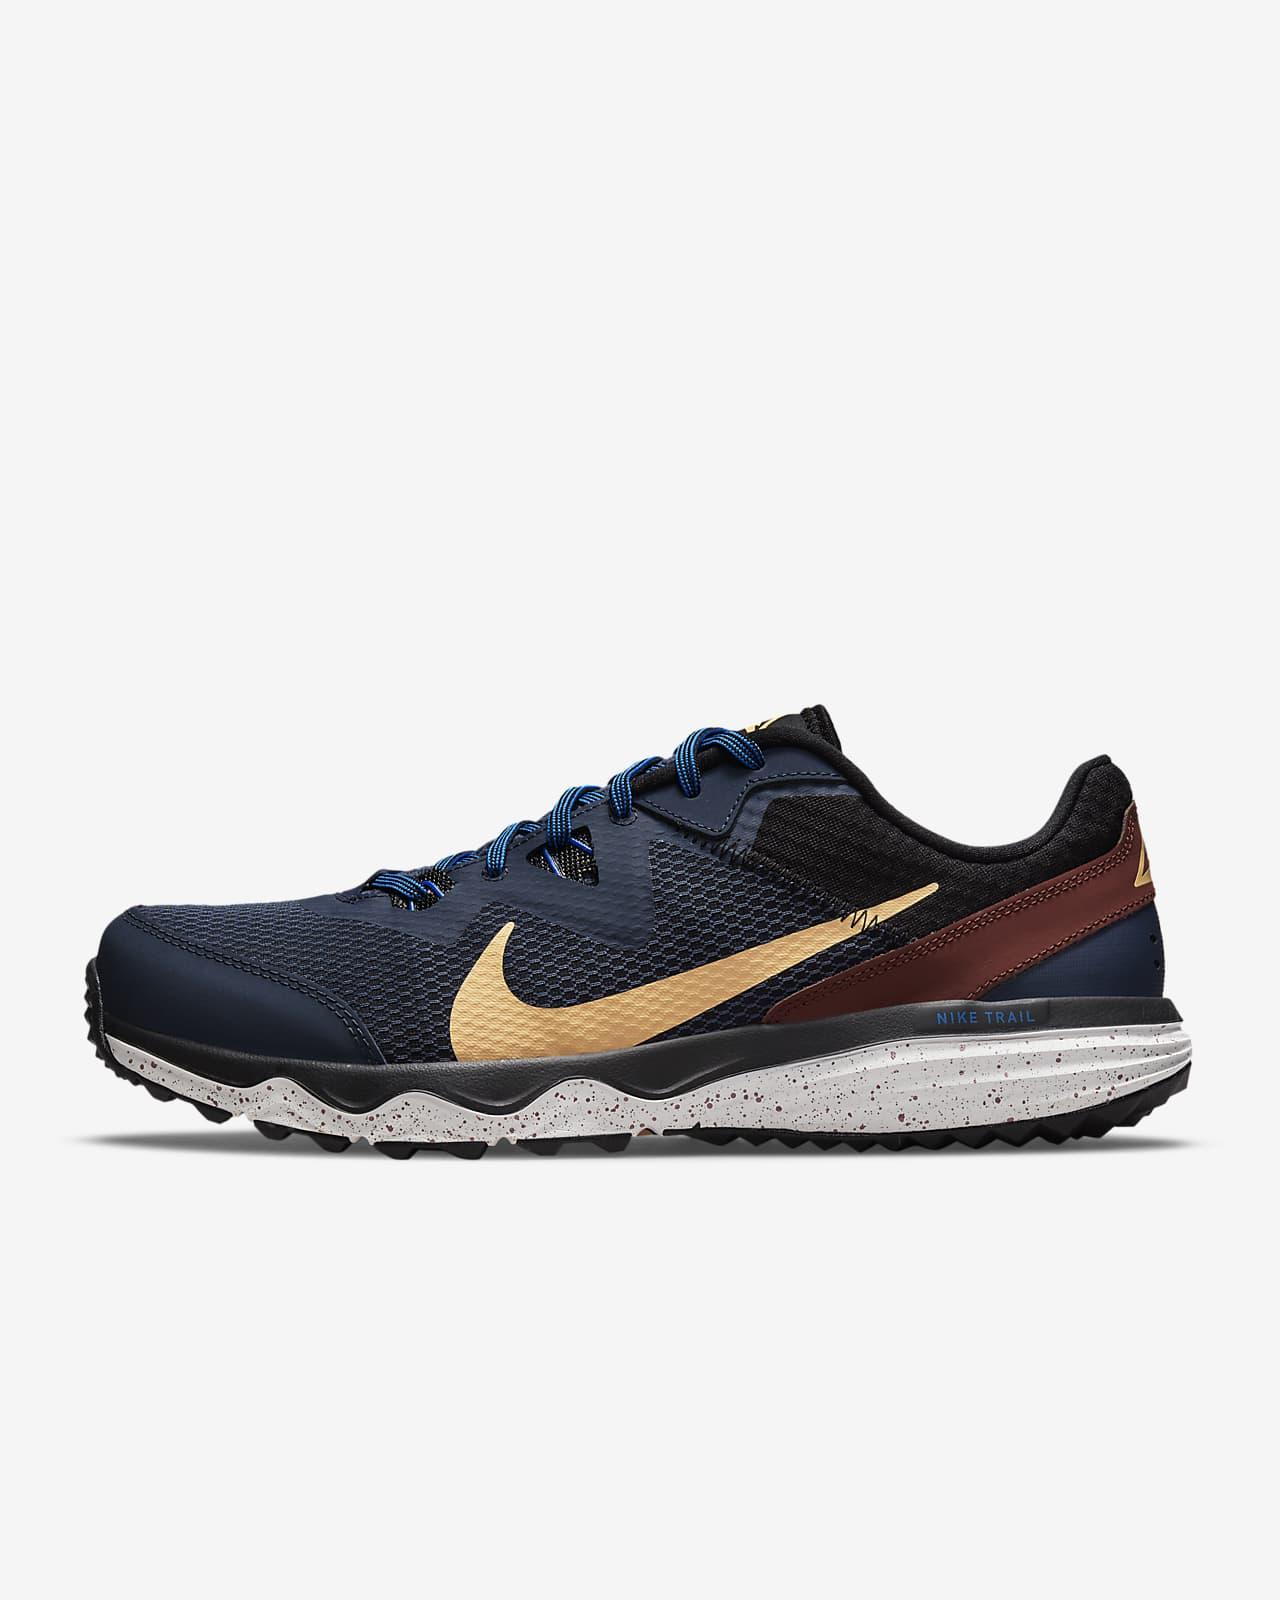 Мужские кроссовки для трейлраннинга Nike Juniper Trail